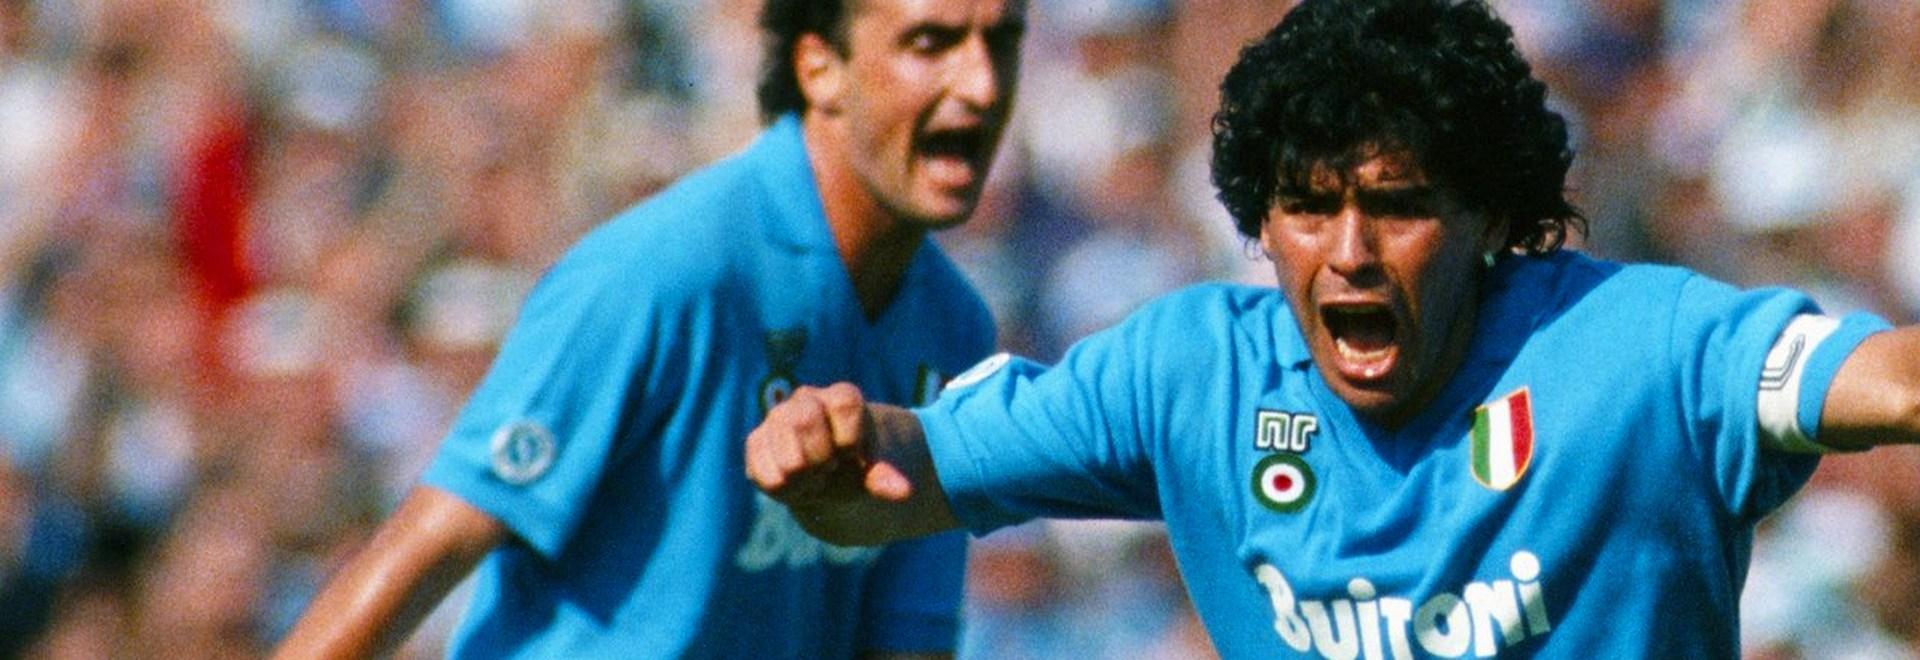 #StorieDiMatteoMarani - Ho visto Maradona